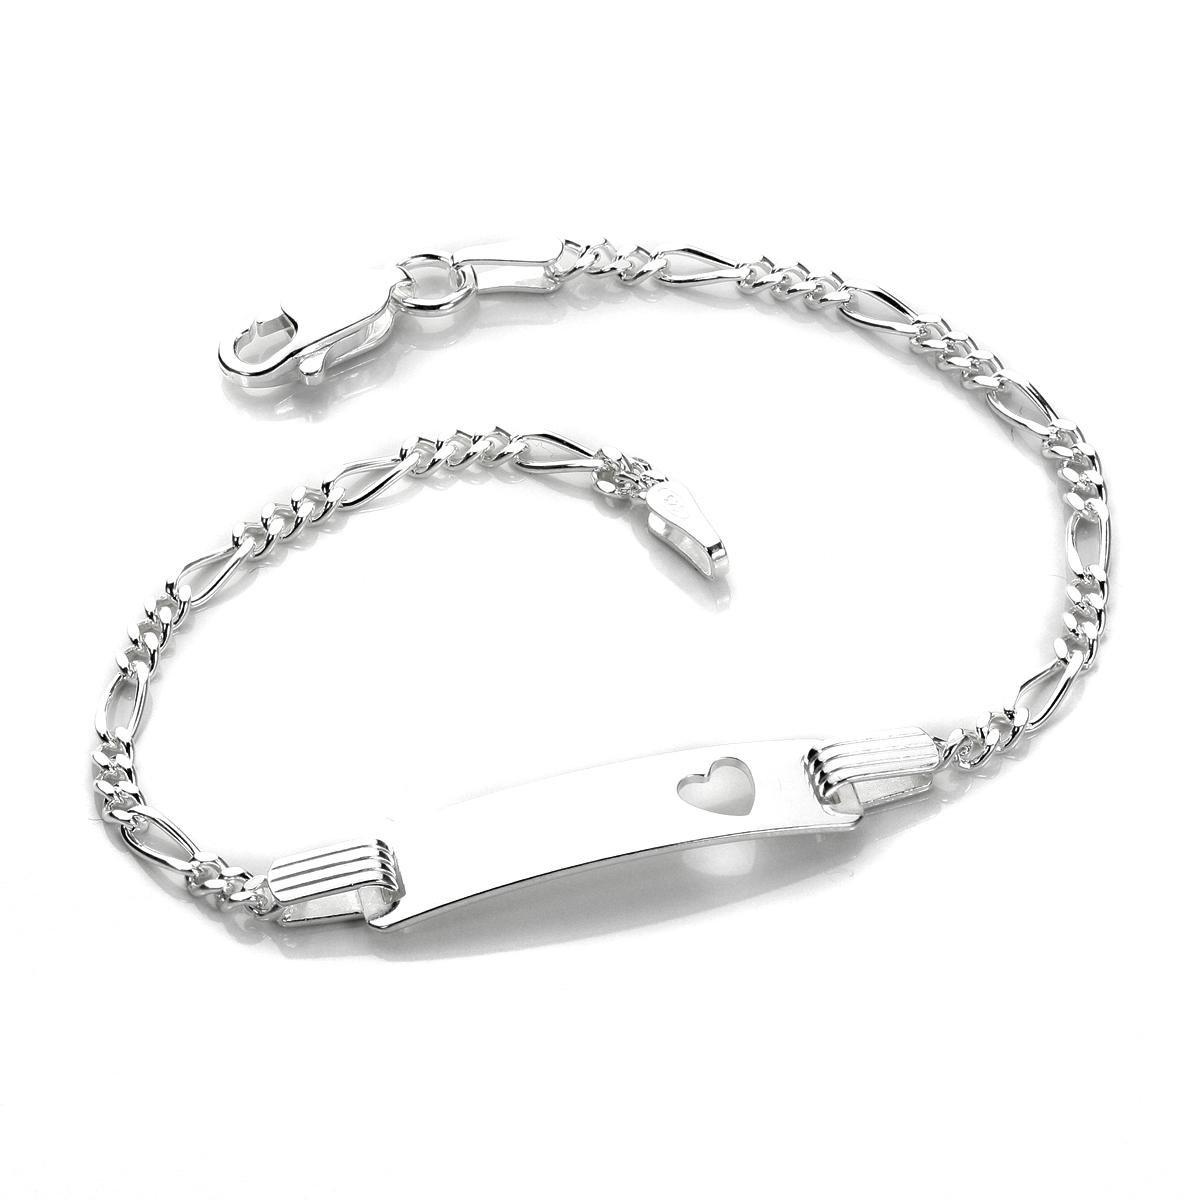 Silver Baby Heart Identity ID Bracelet JewelleryBox HJ-015